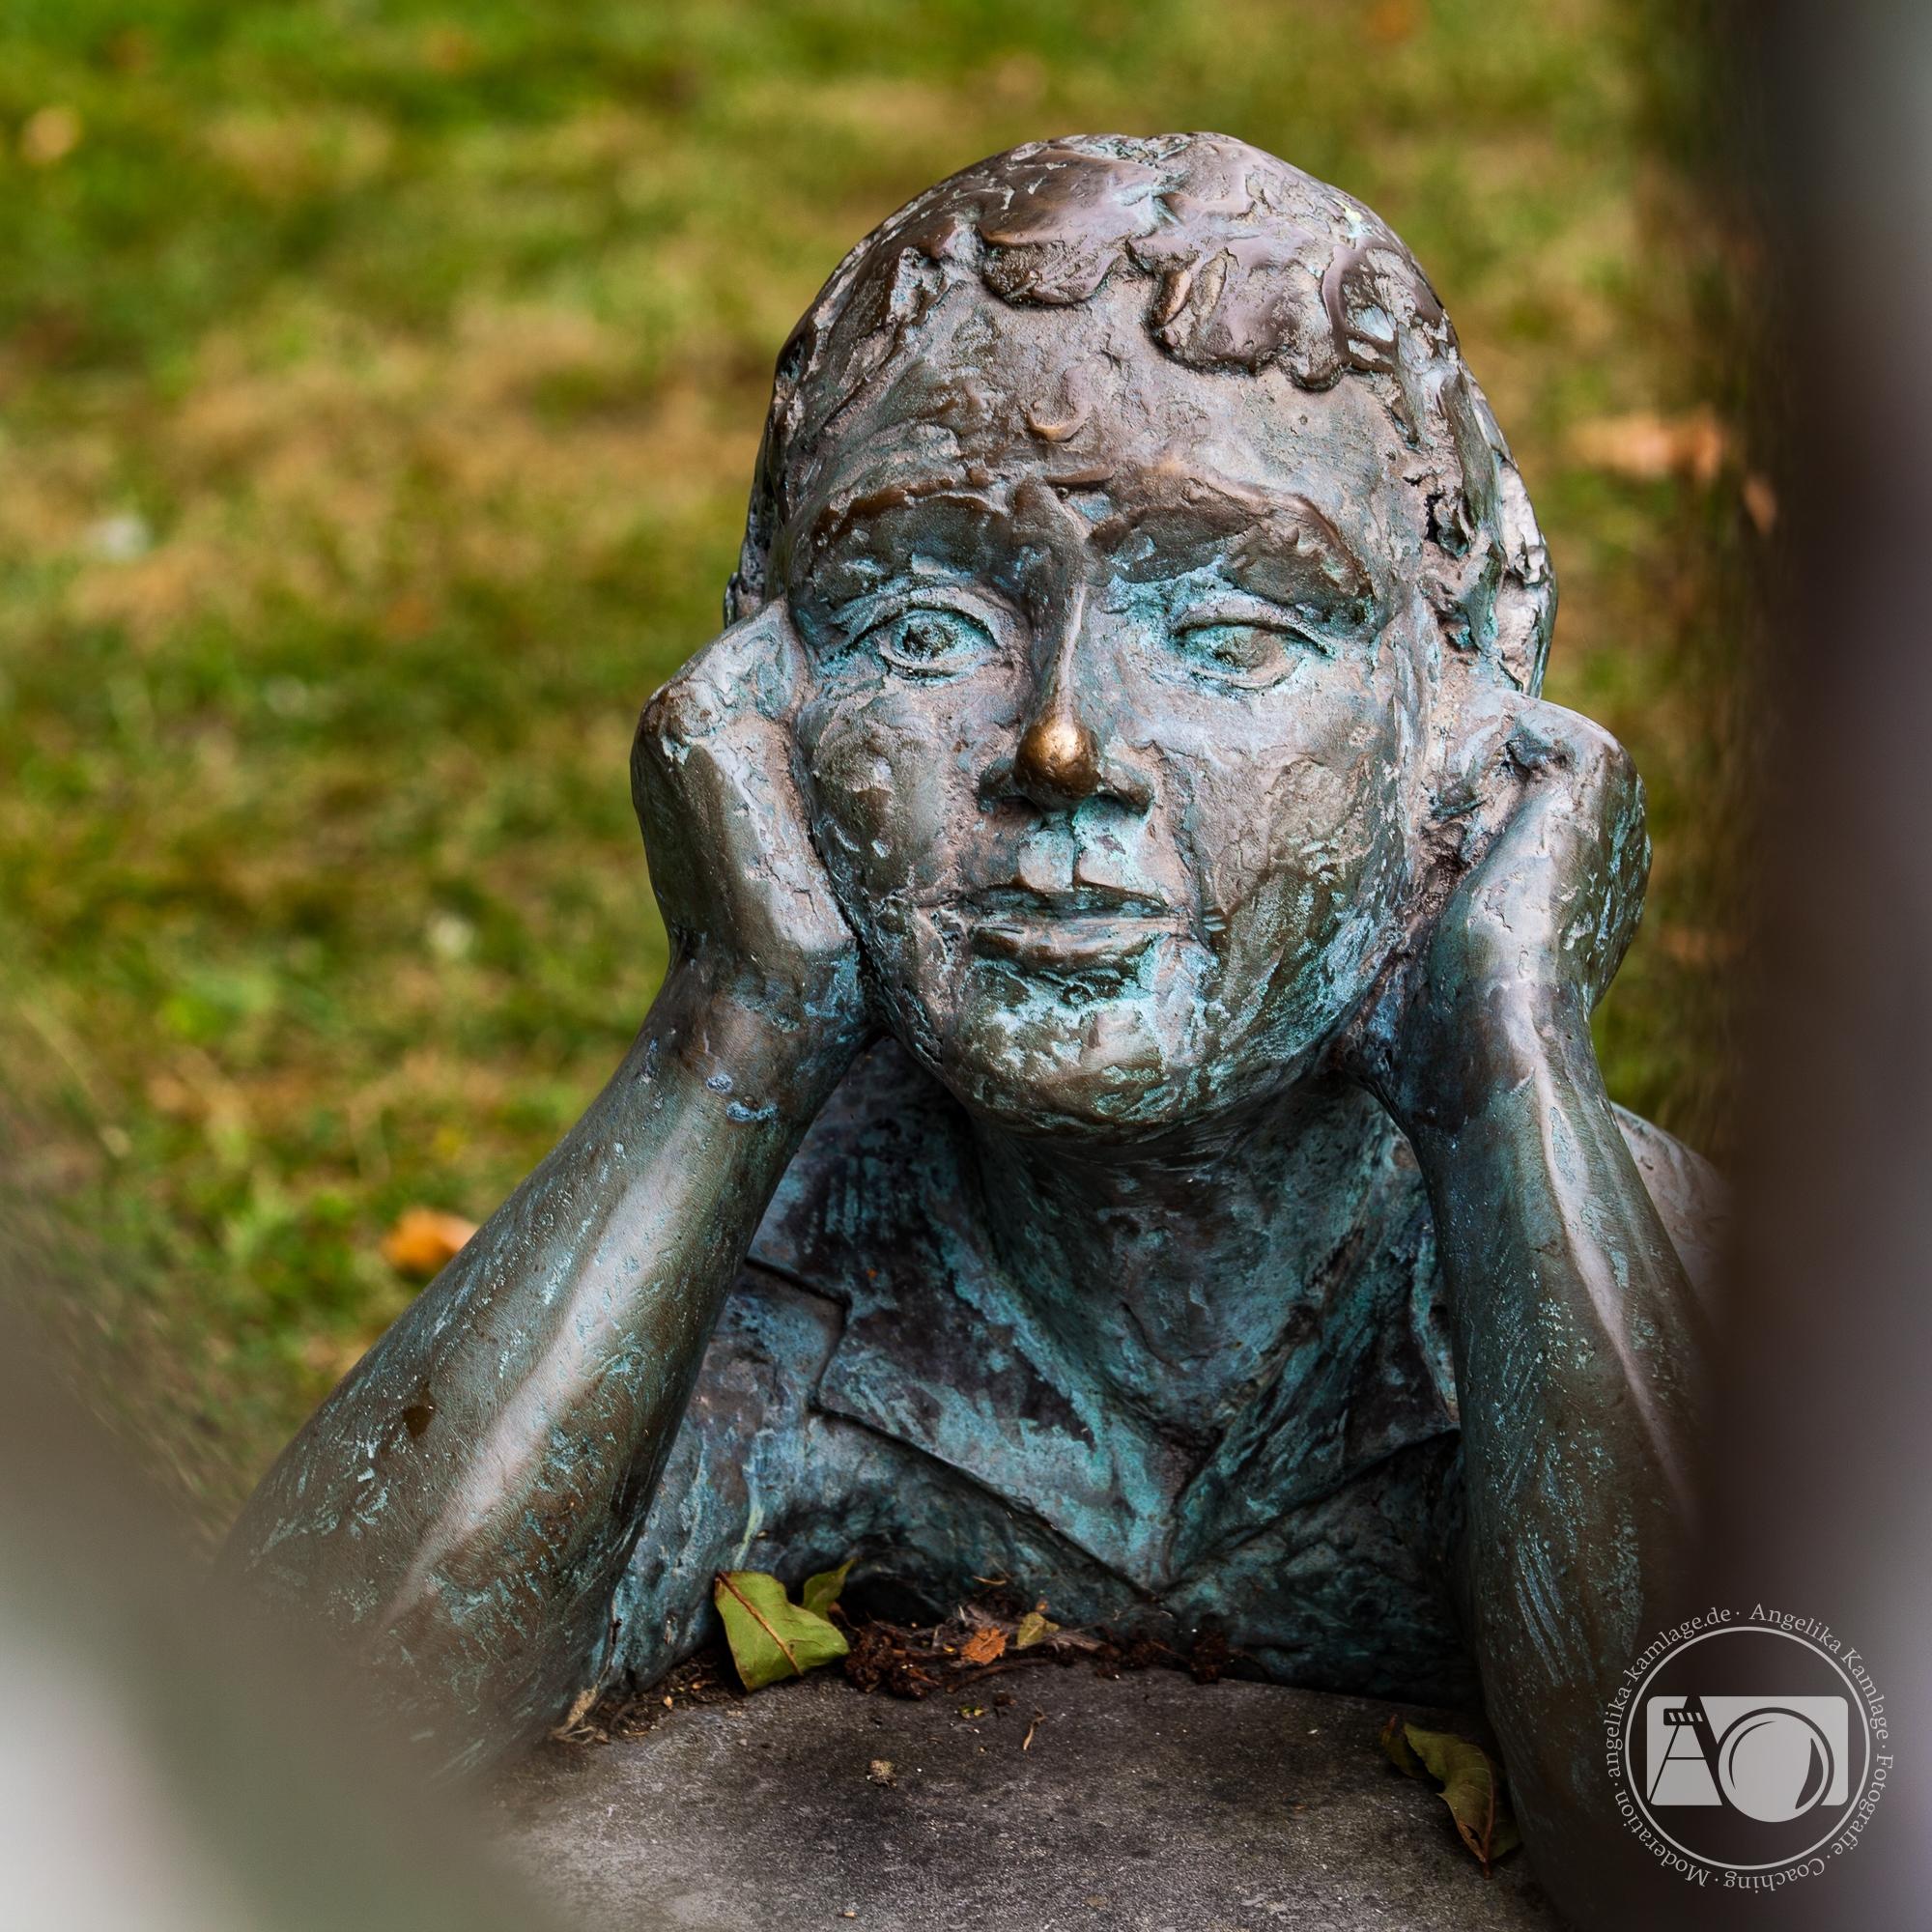 Foto-Exerzitien (online) – ein Rückblick